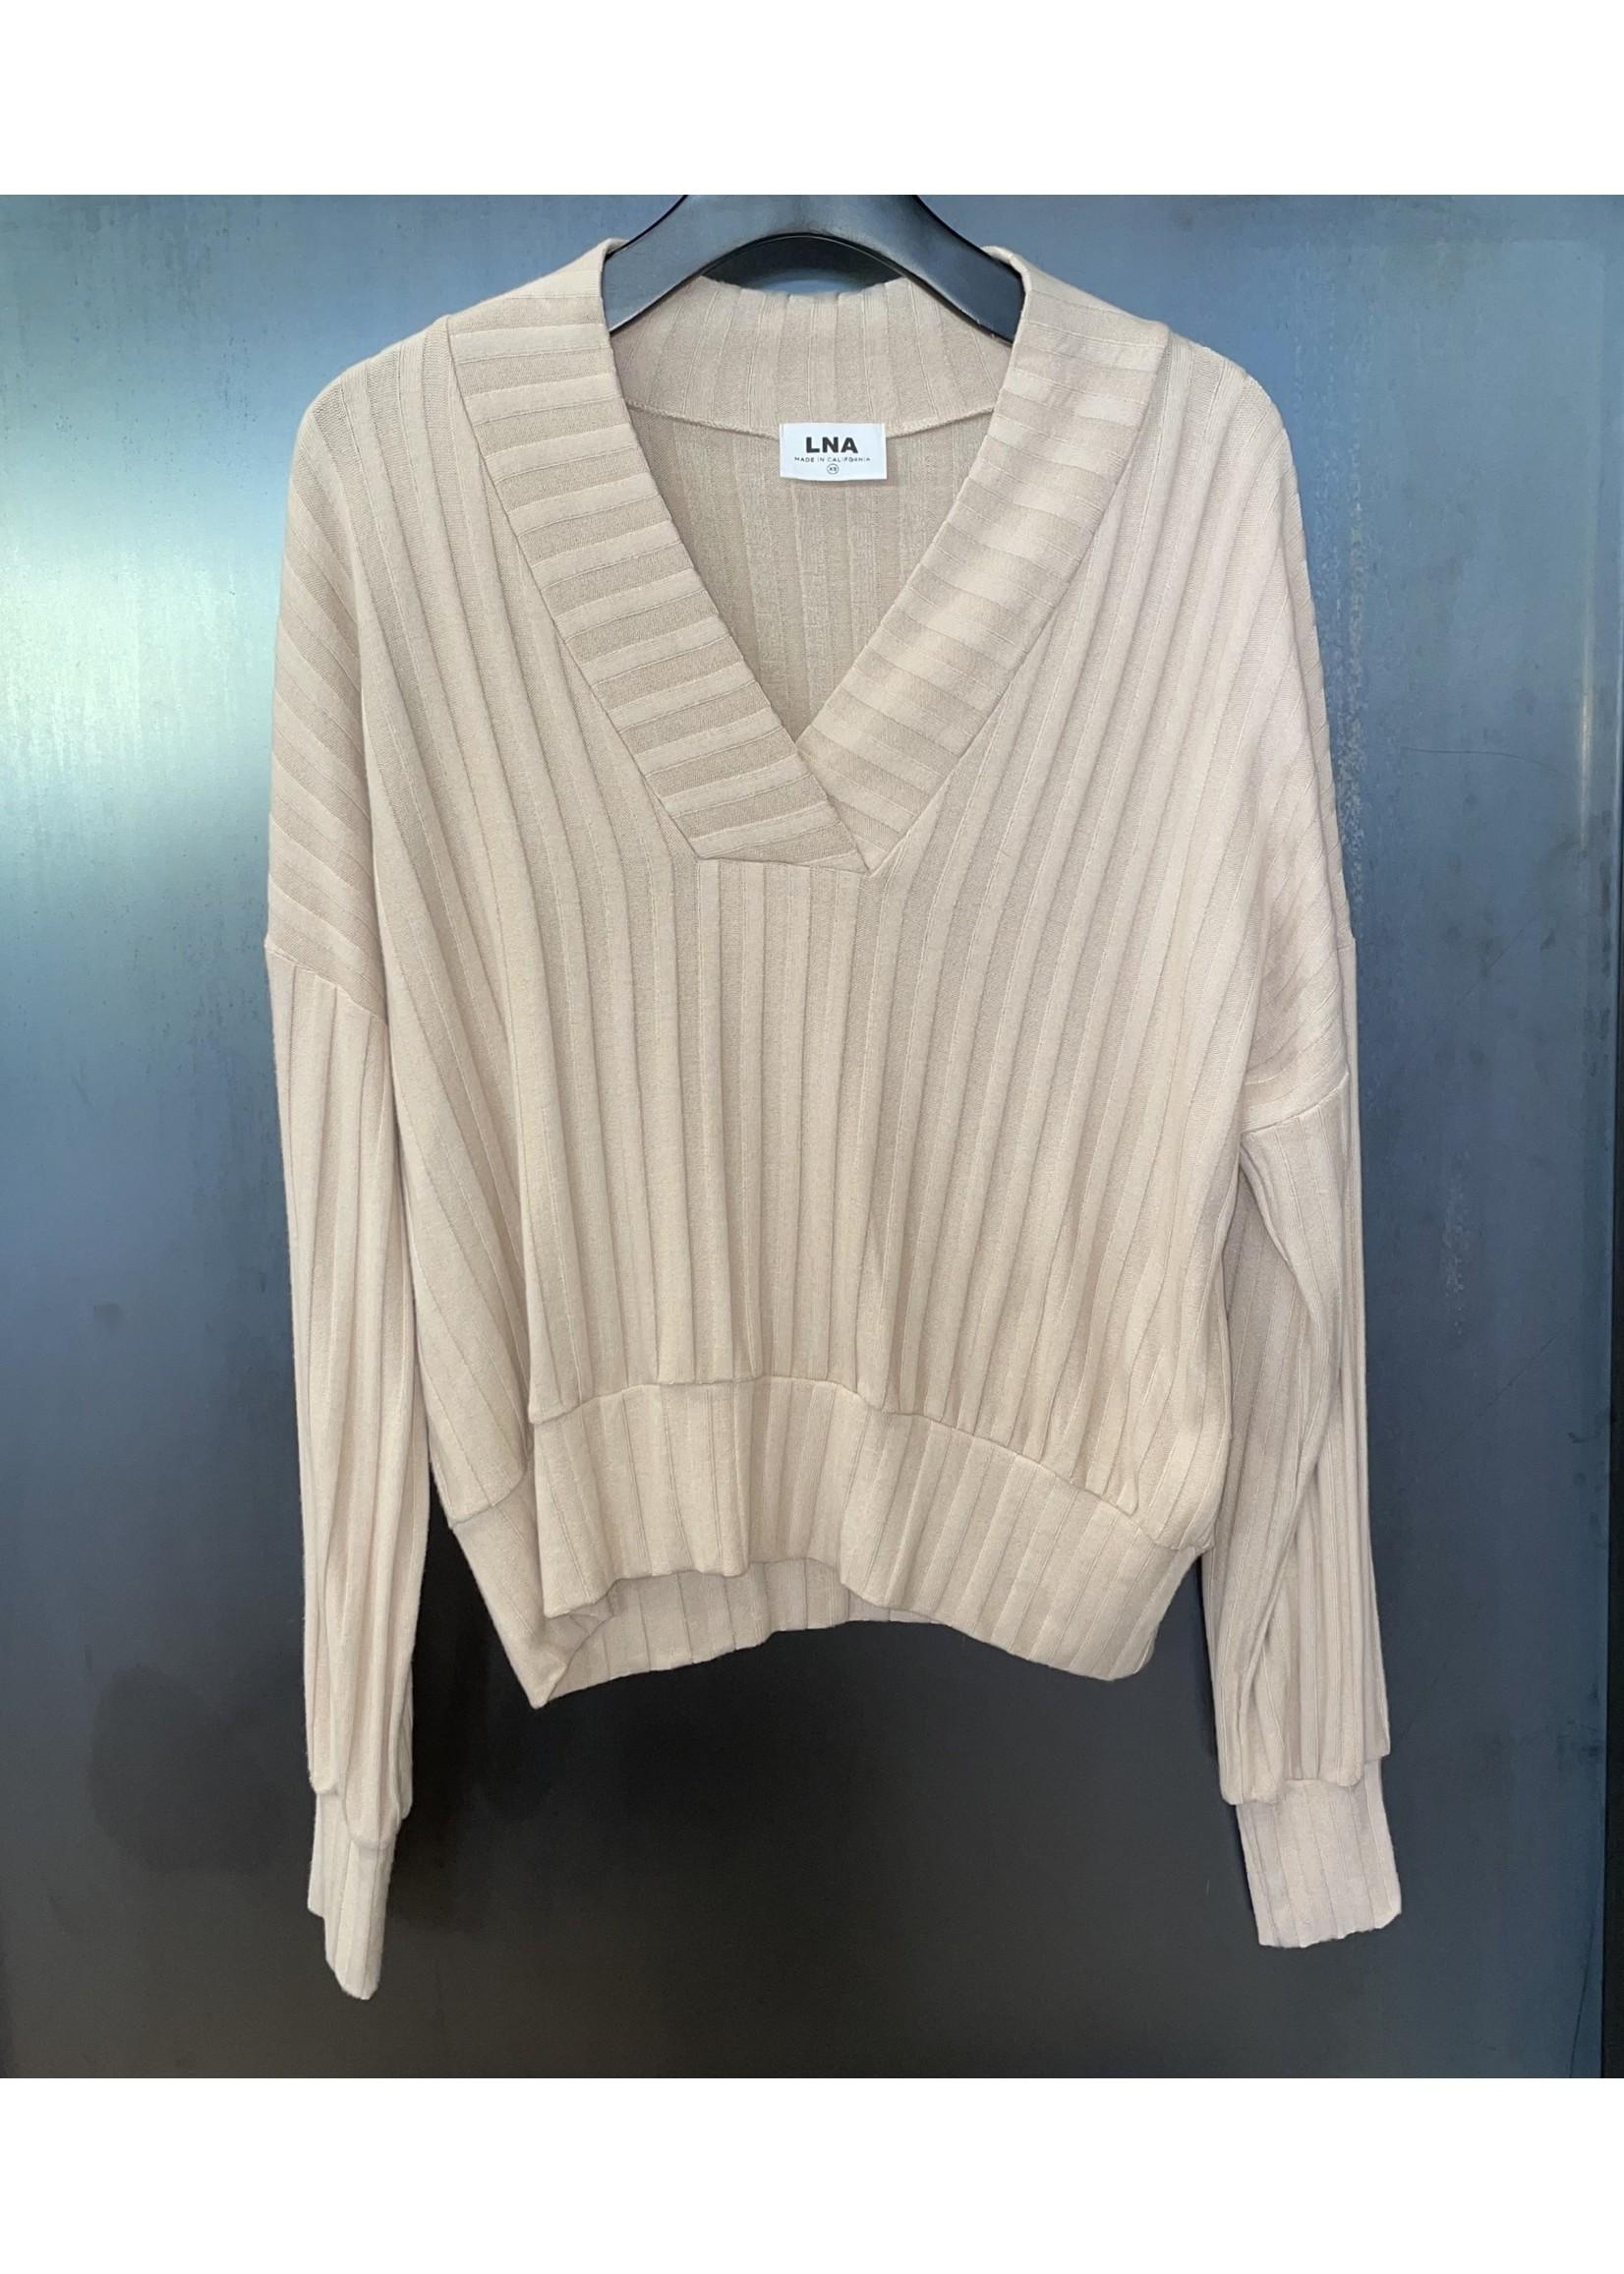 LNA Clothing LNA Gabrielle L/S Top